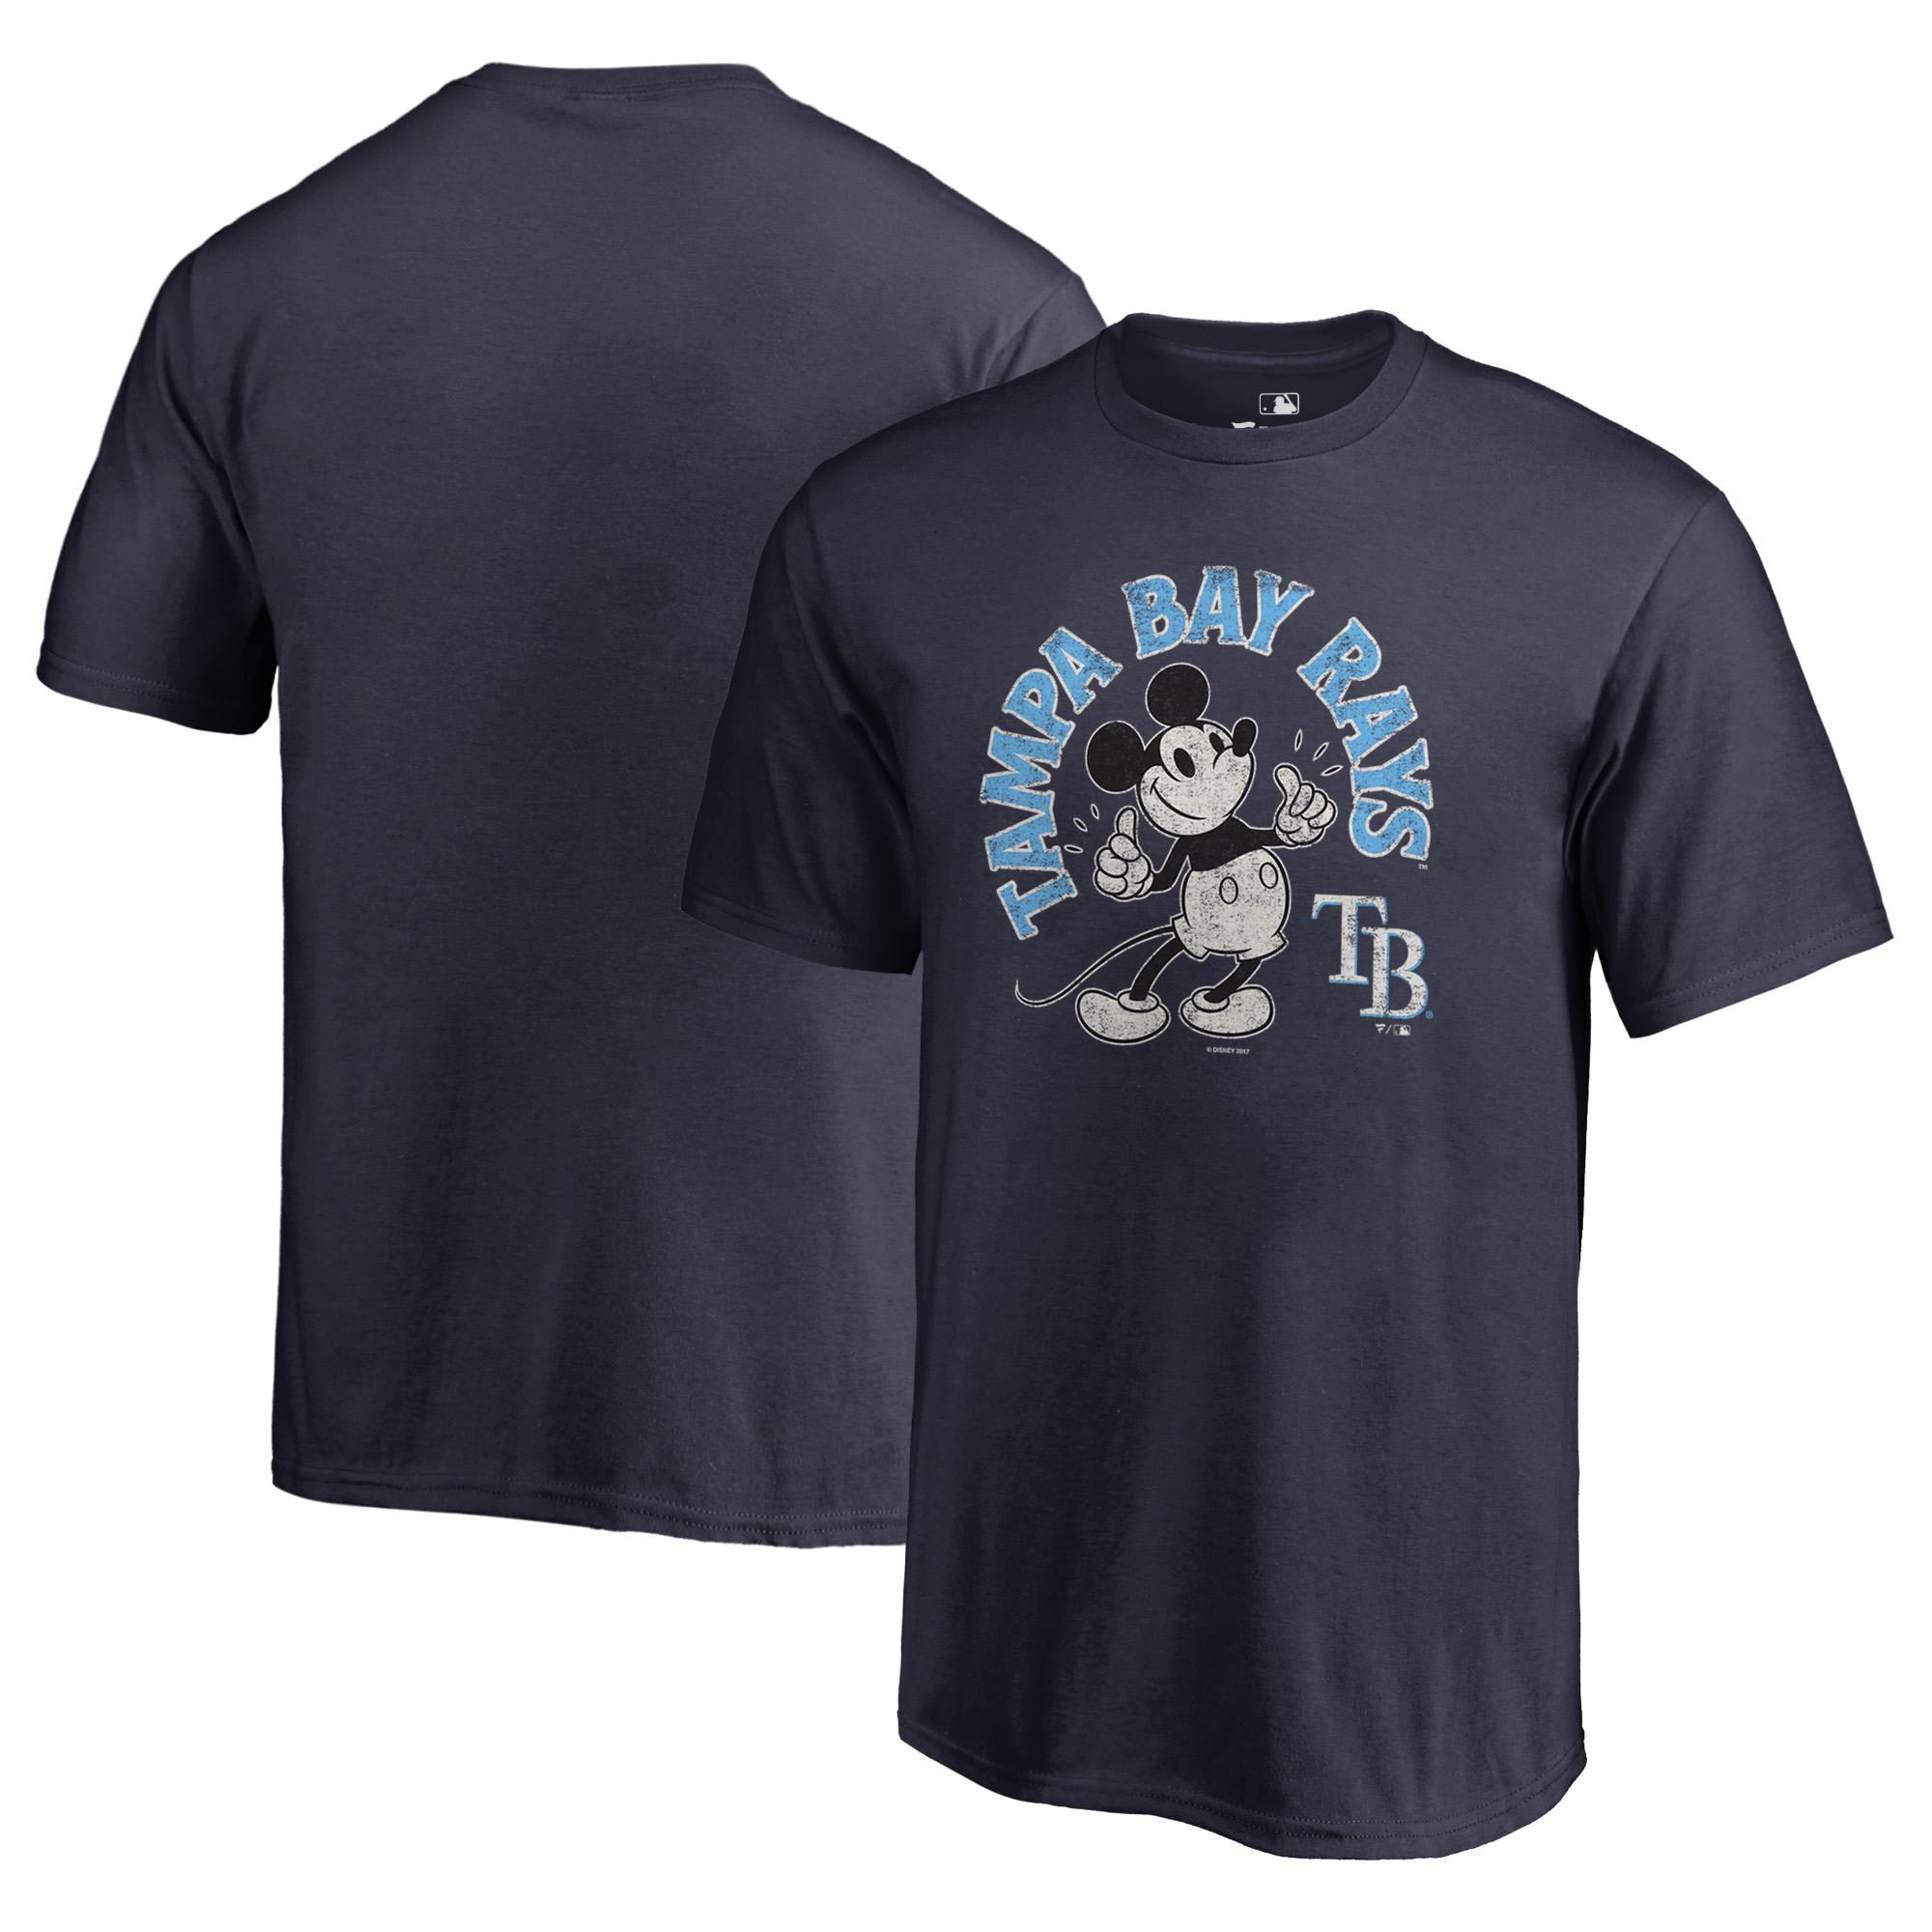 Tampa Bay Rays Fanatics Branded Youth Disney Mickey's True Original Arch T-Shirt - Navy